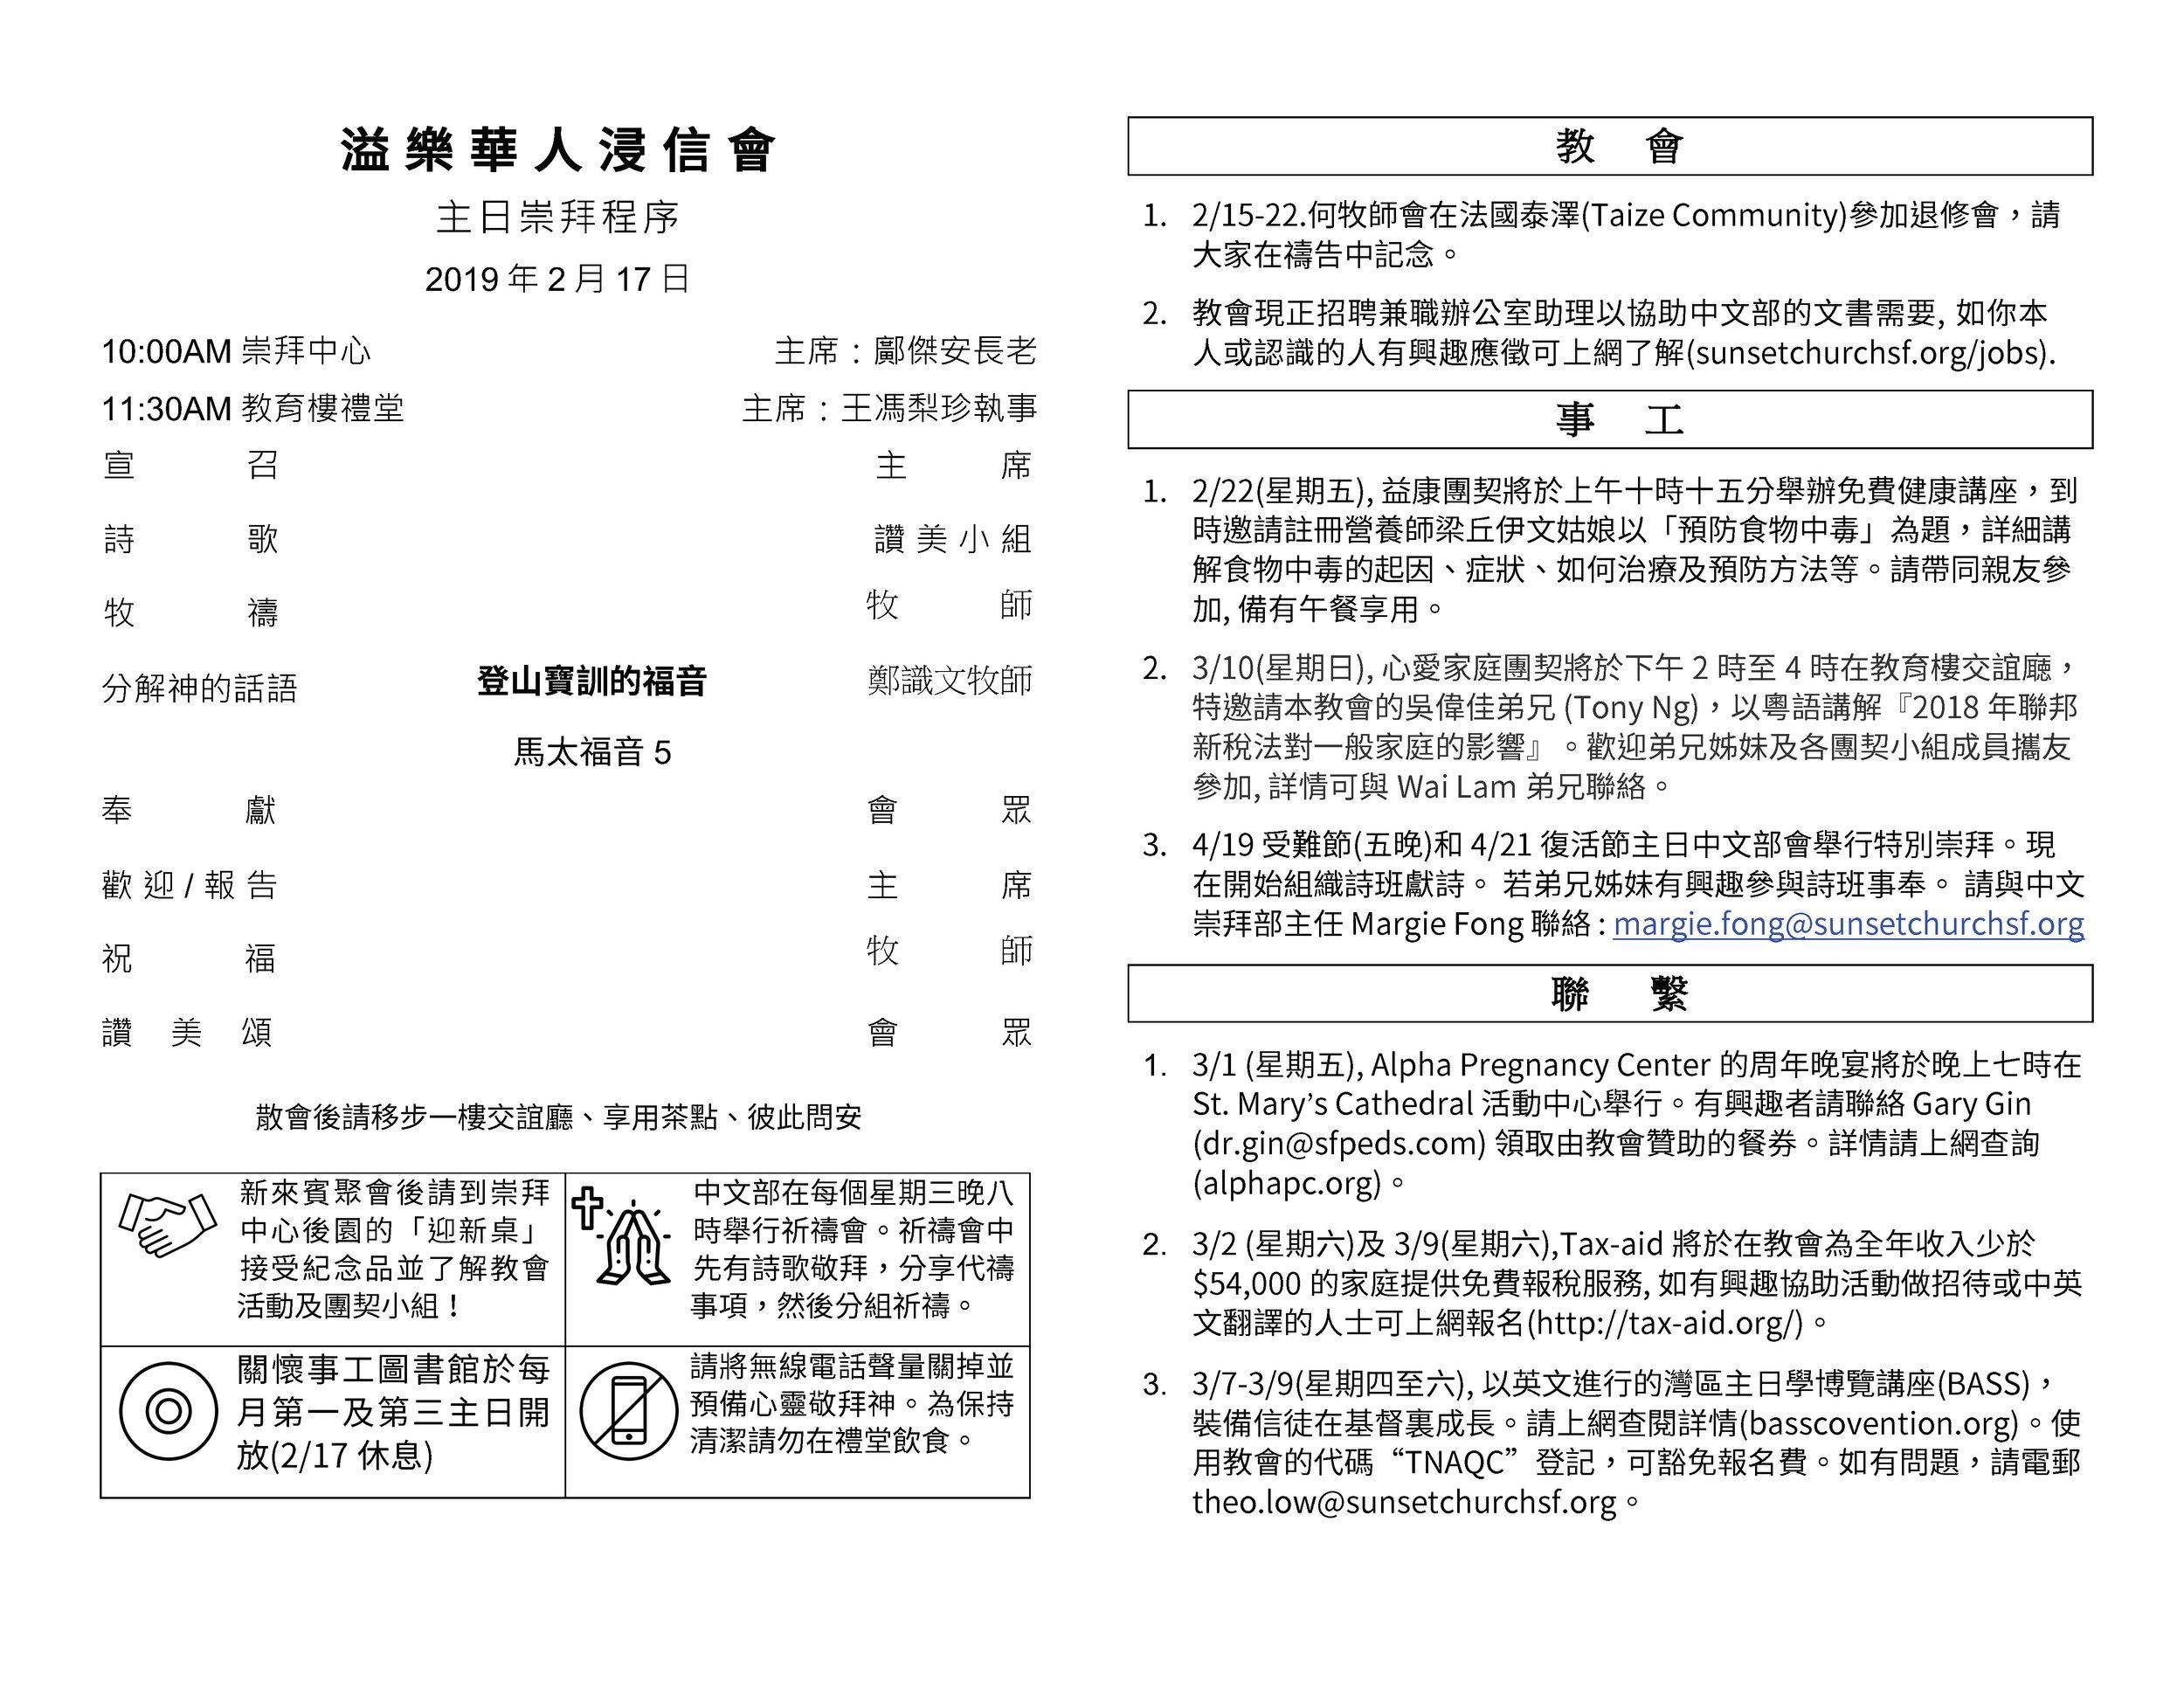 Chinese Bulletins 2.17.2019_Page_2.jpg